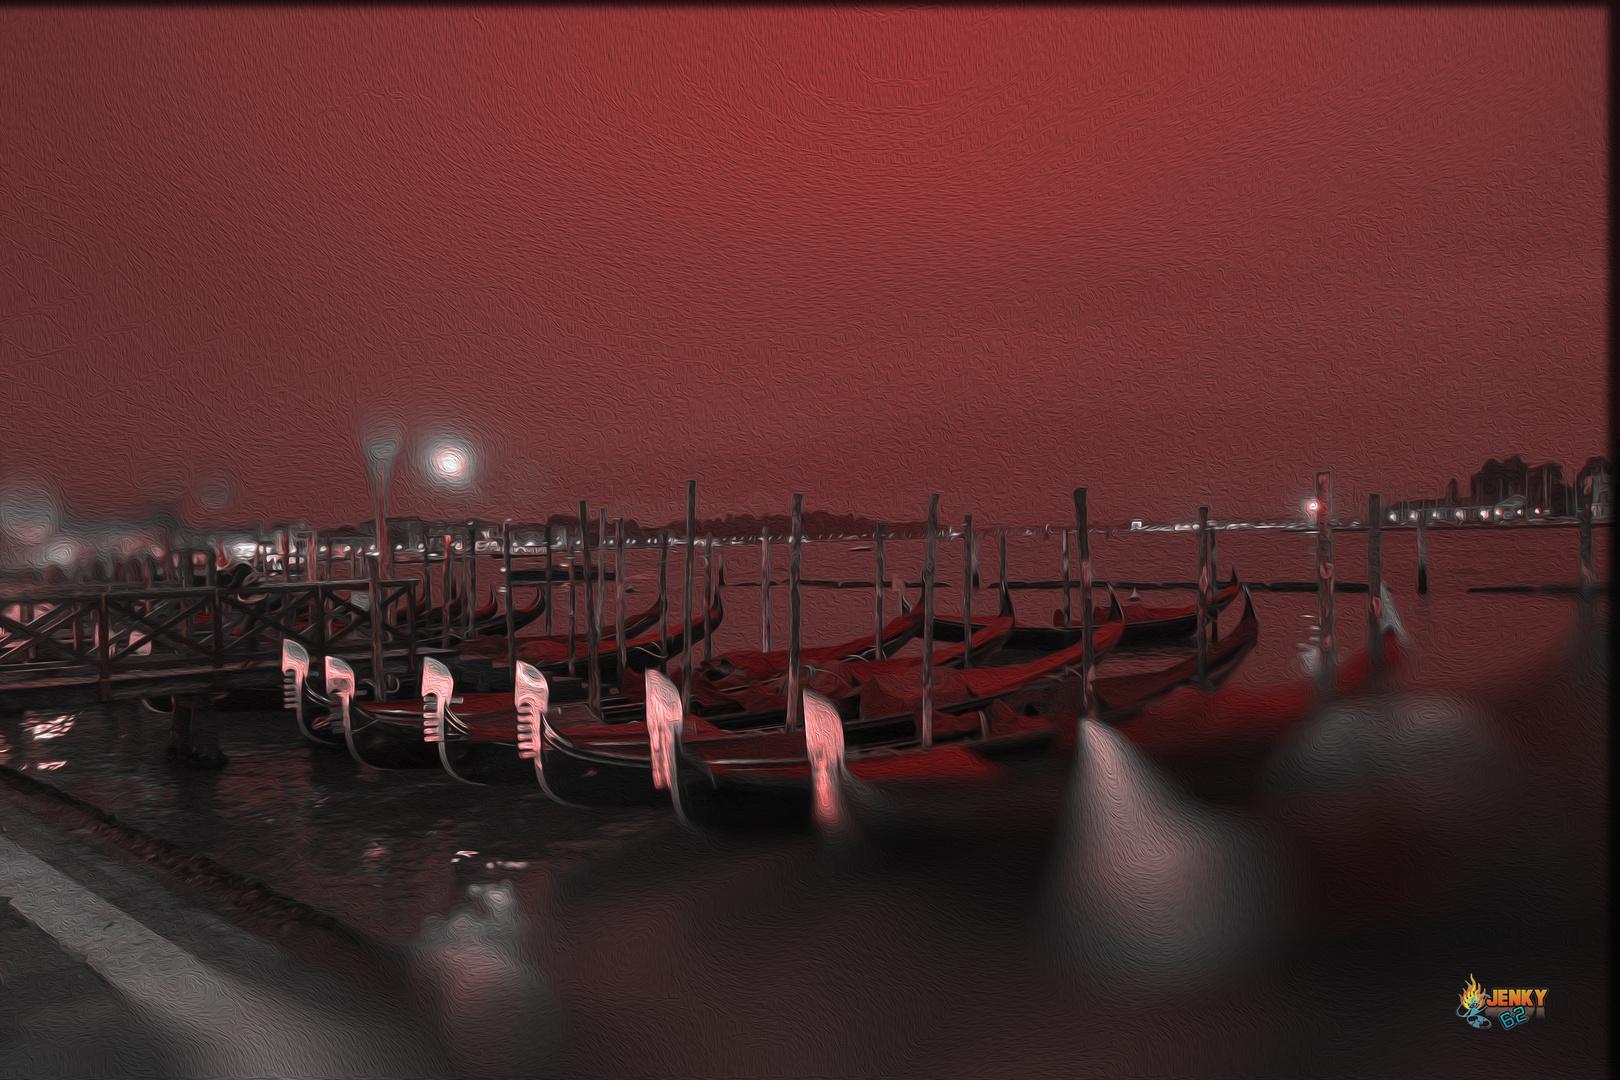 Red Venice